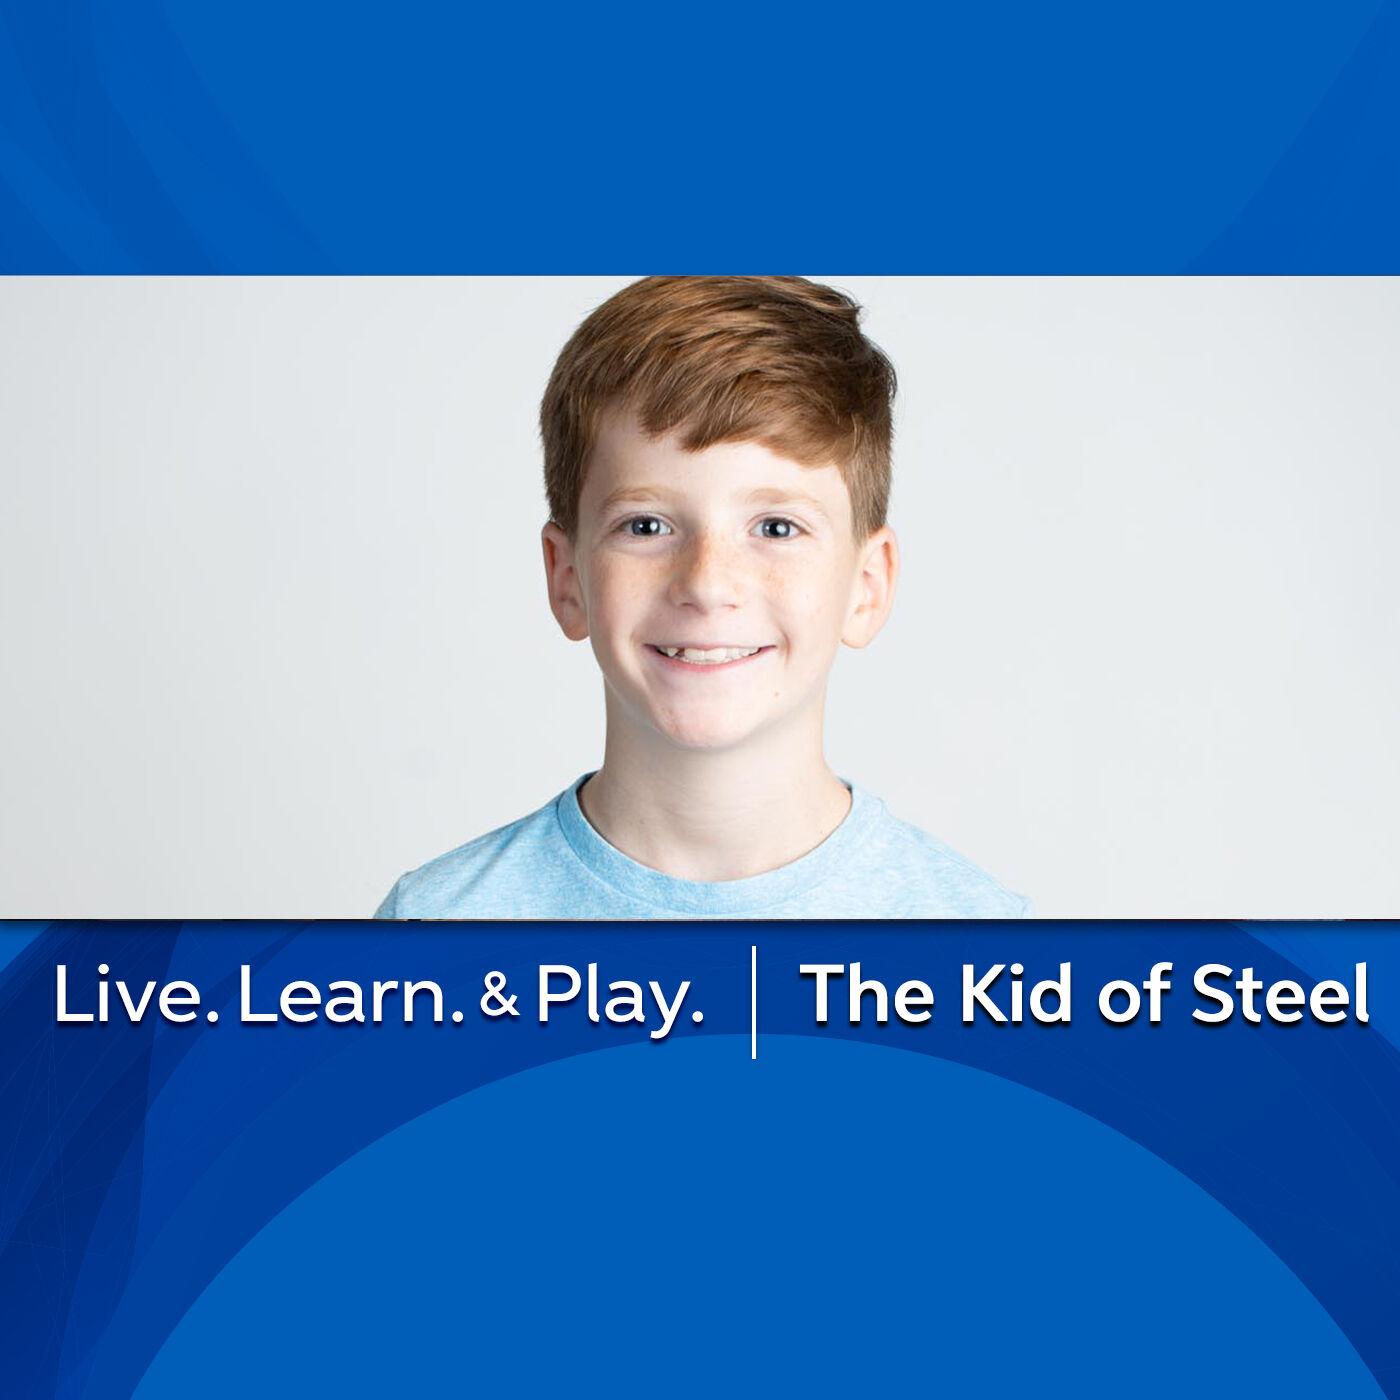 The Kid of Steel